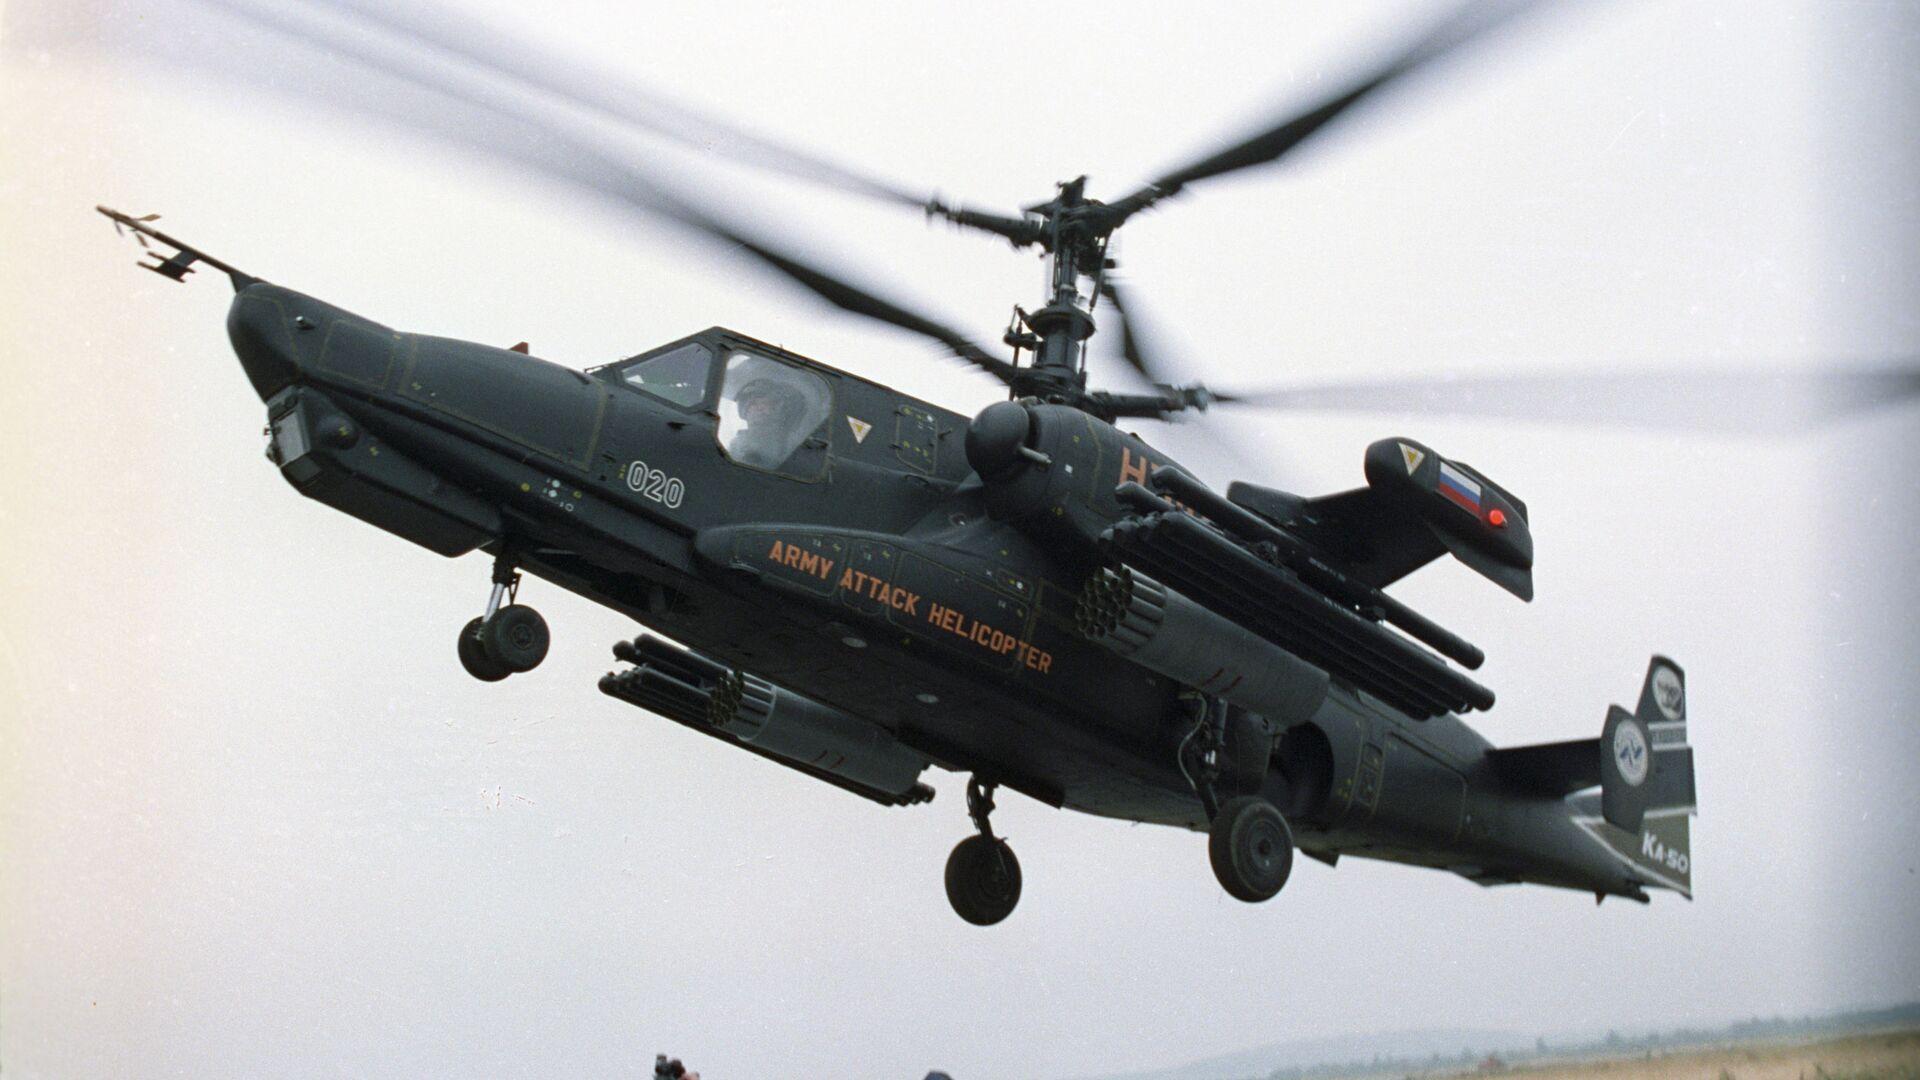 Helicóptero de ataque Ka-50 Tiburón Negro - Sputnik Mundo, 1920, 06.01.2021